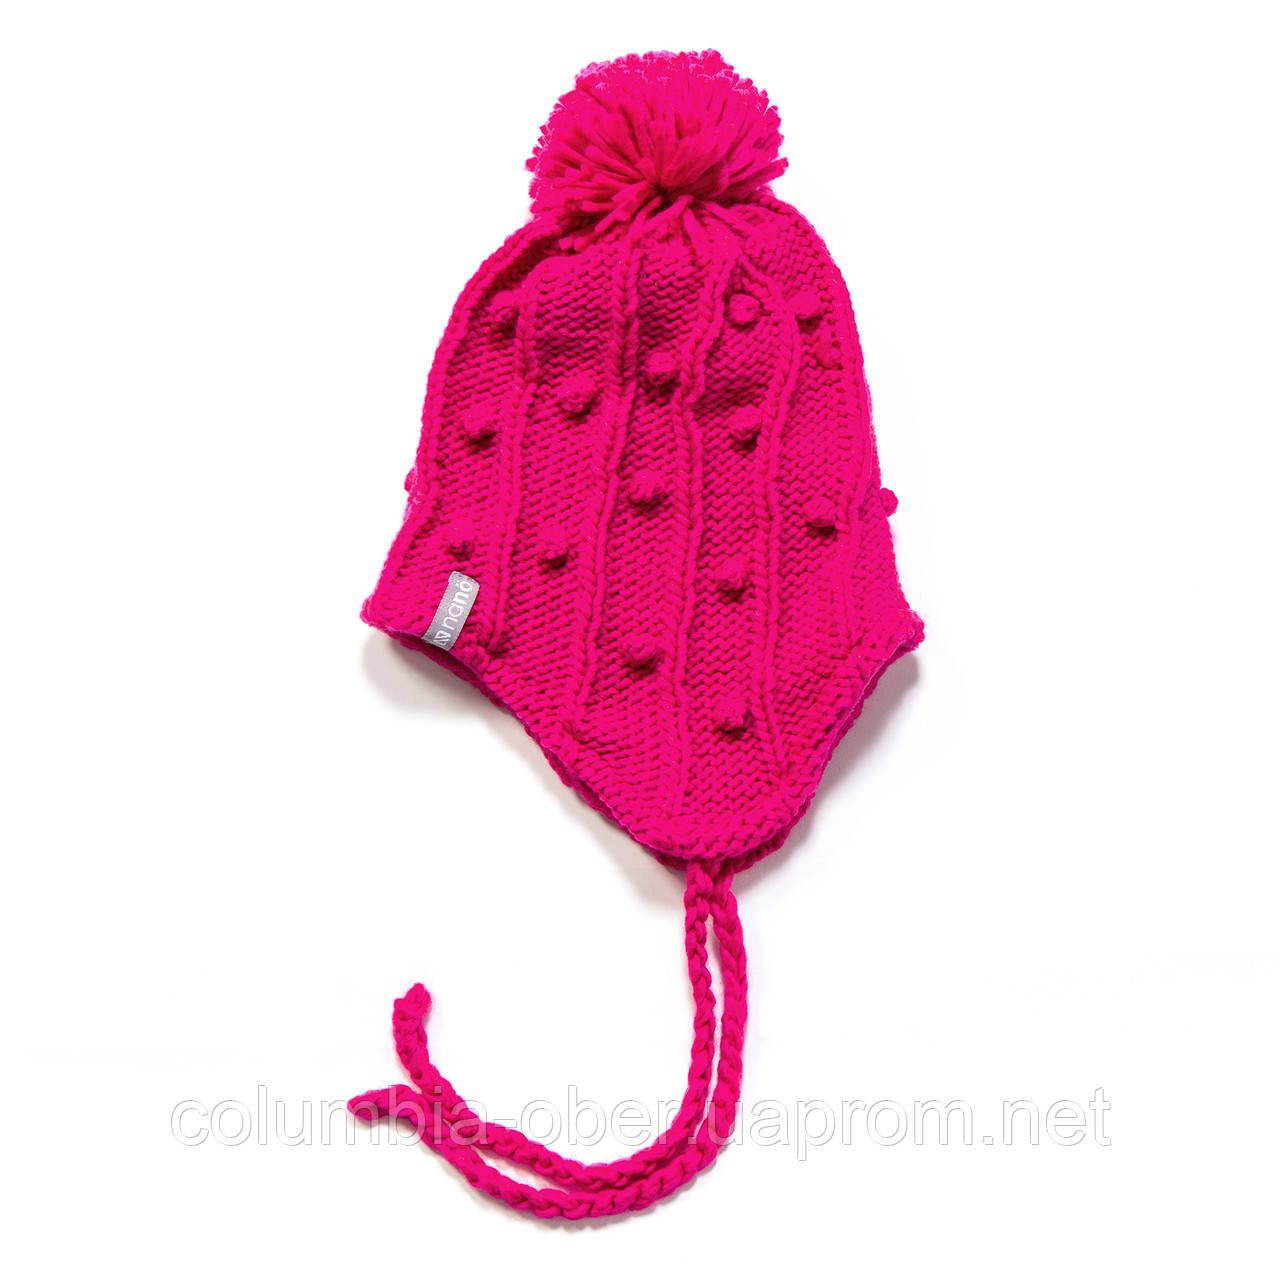 Зимняя детская шапка для девочки Nano F17 TU 272 Virtual Pink. Размеры  2/3х- 7-12.